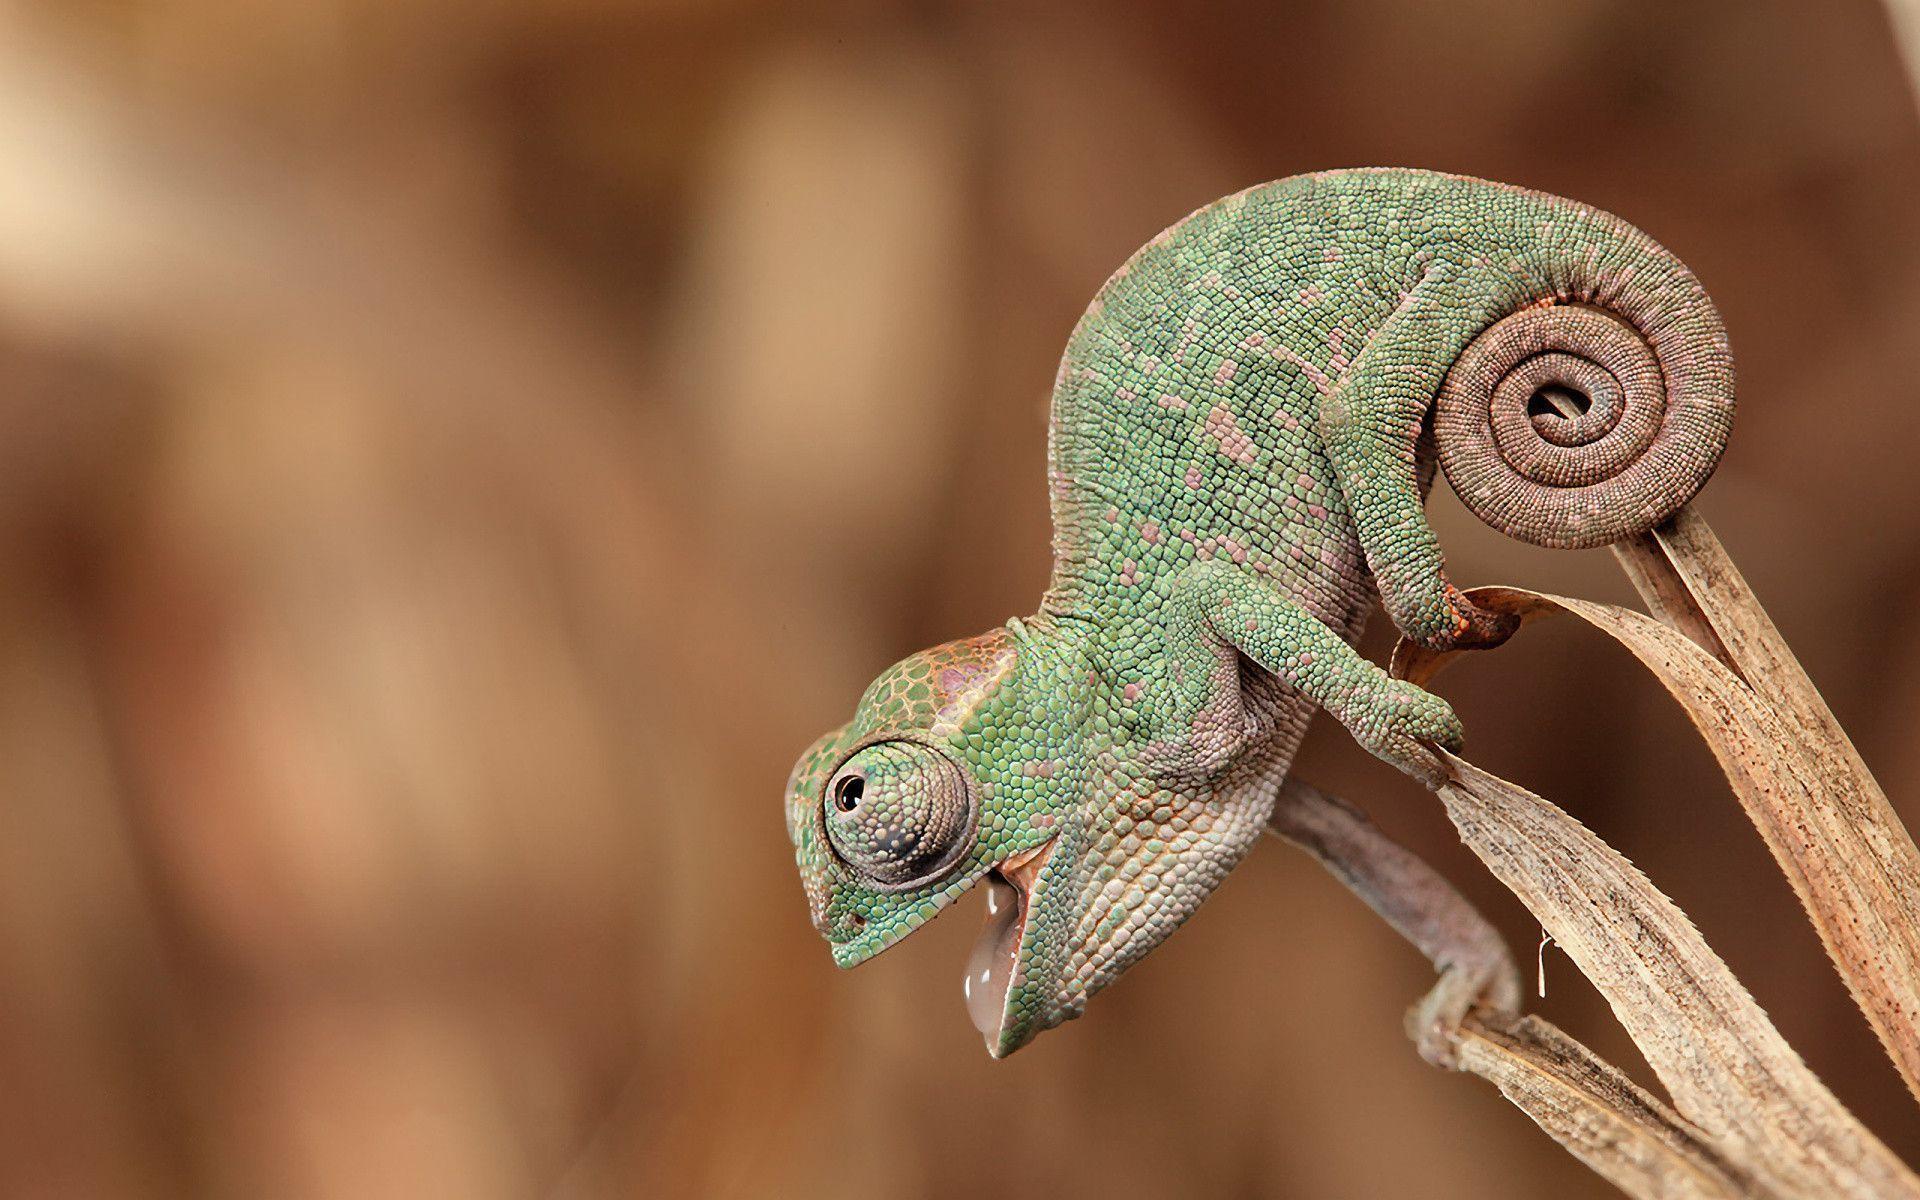 striped chameleon wallpaper hd - photo #24